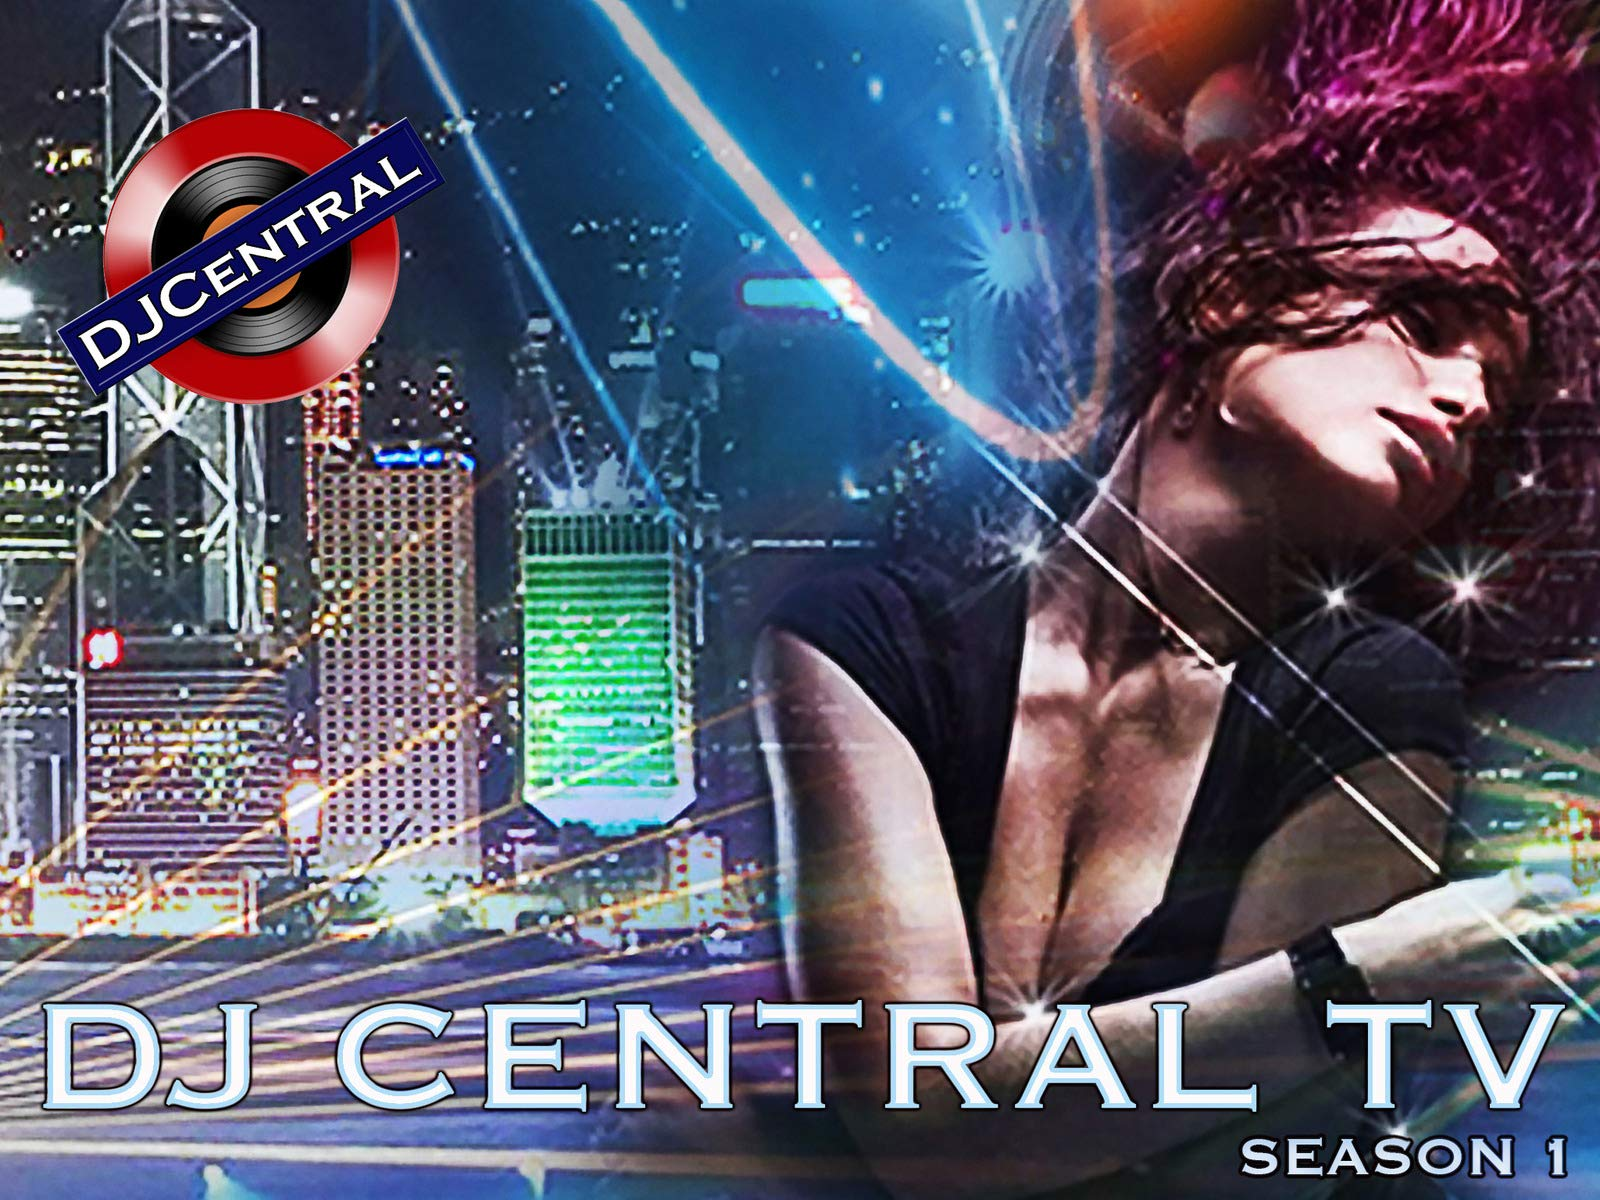 DJ Central TV - Season 1